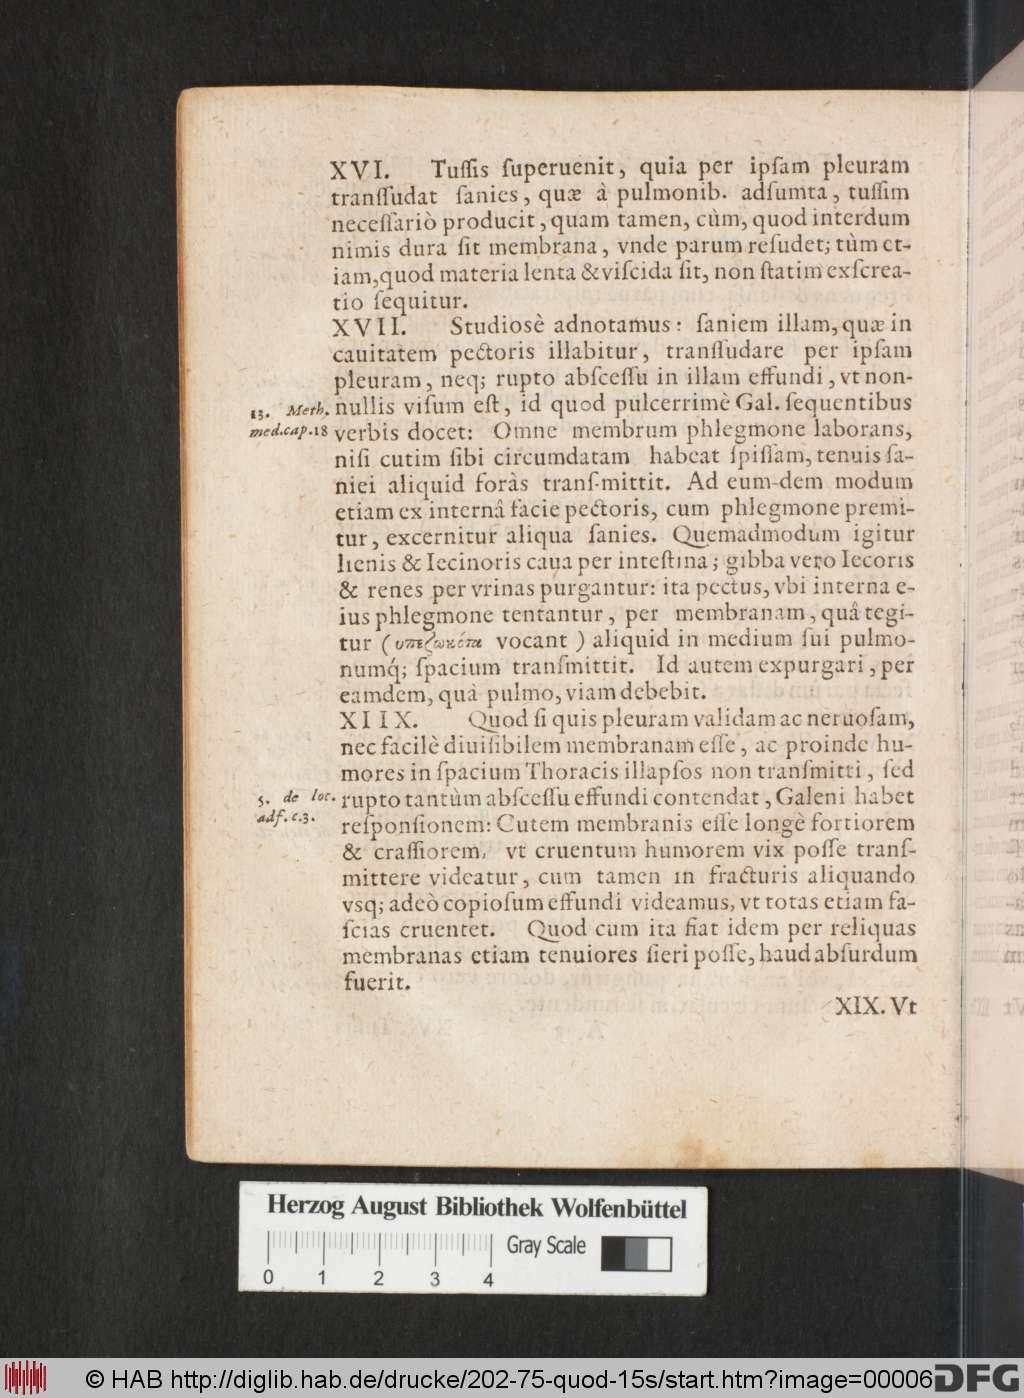 http://diglib.hab.de/drucke/202-75-quod-15s/00006.jpg